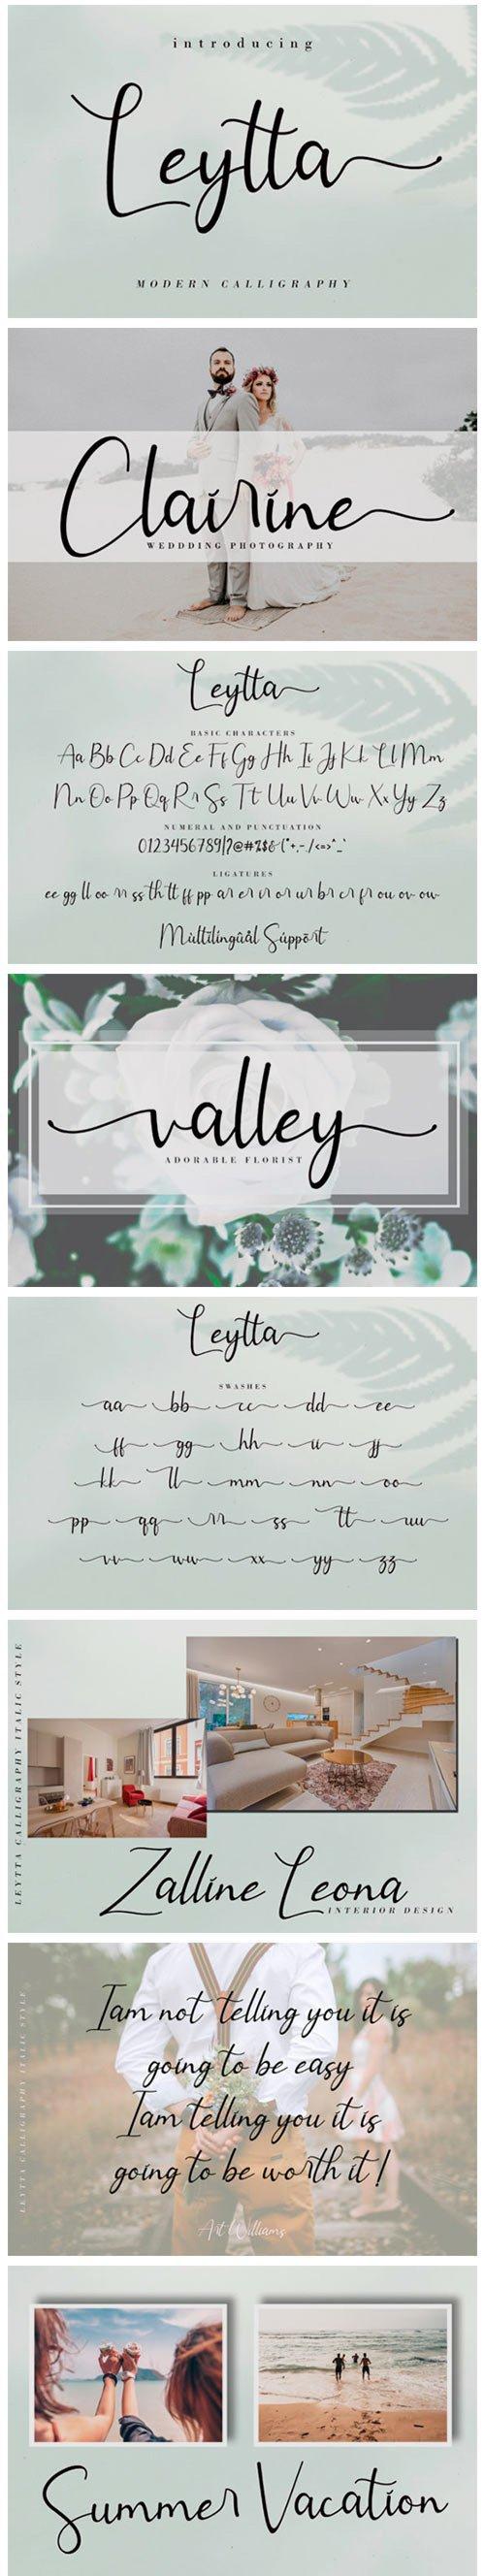 Leytta Font